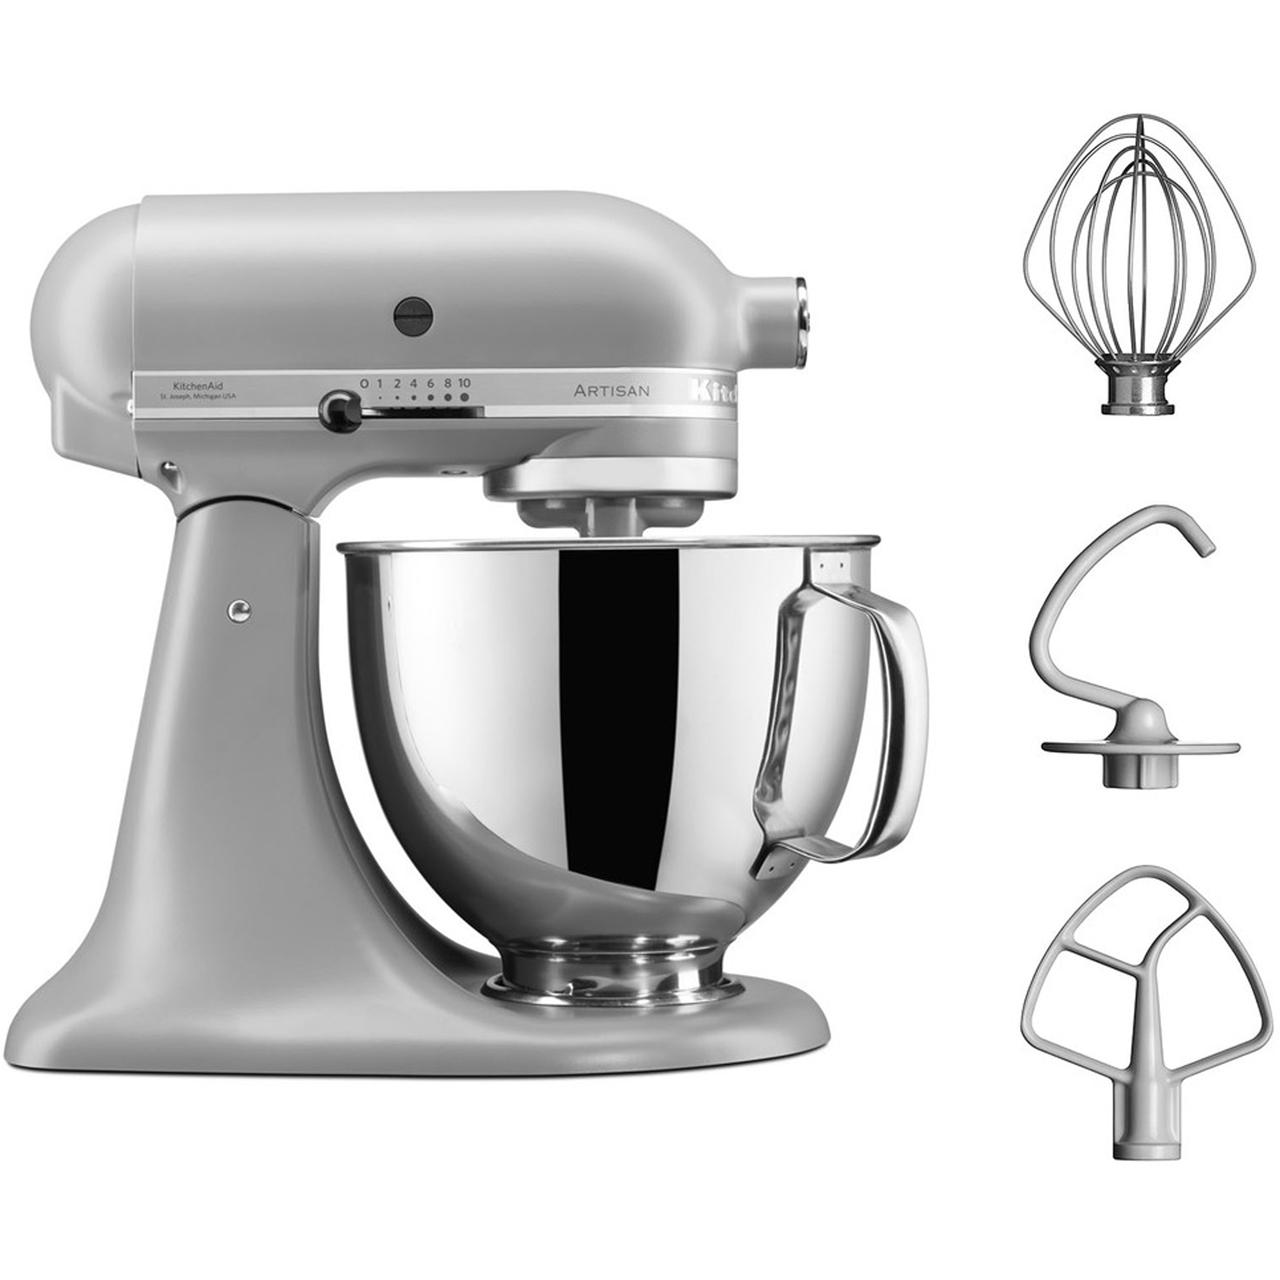 Kitchenaid Artisan 5ksm125bfg Stand Mixer With 4 8 Litre Bowl Matte Grey